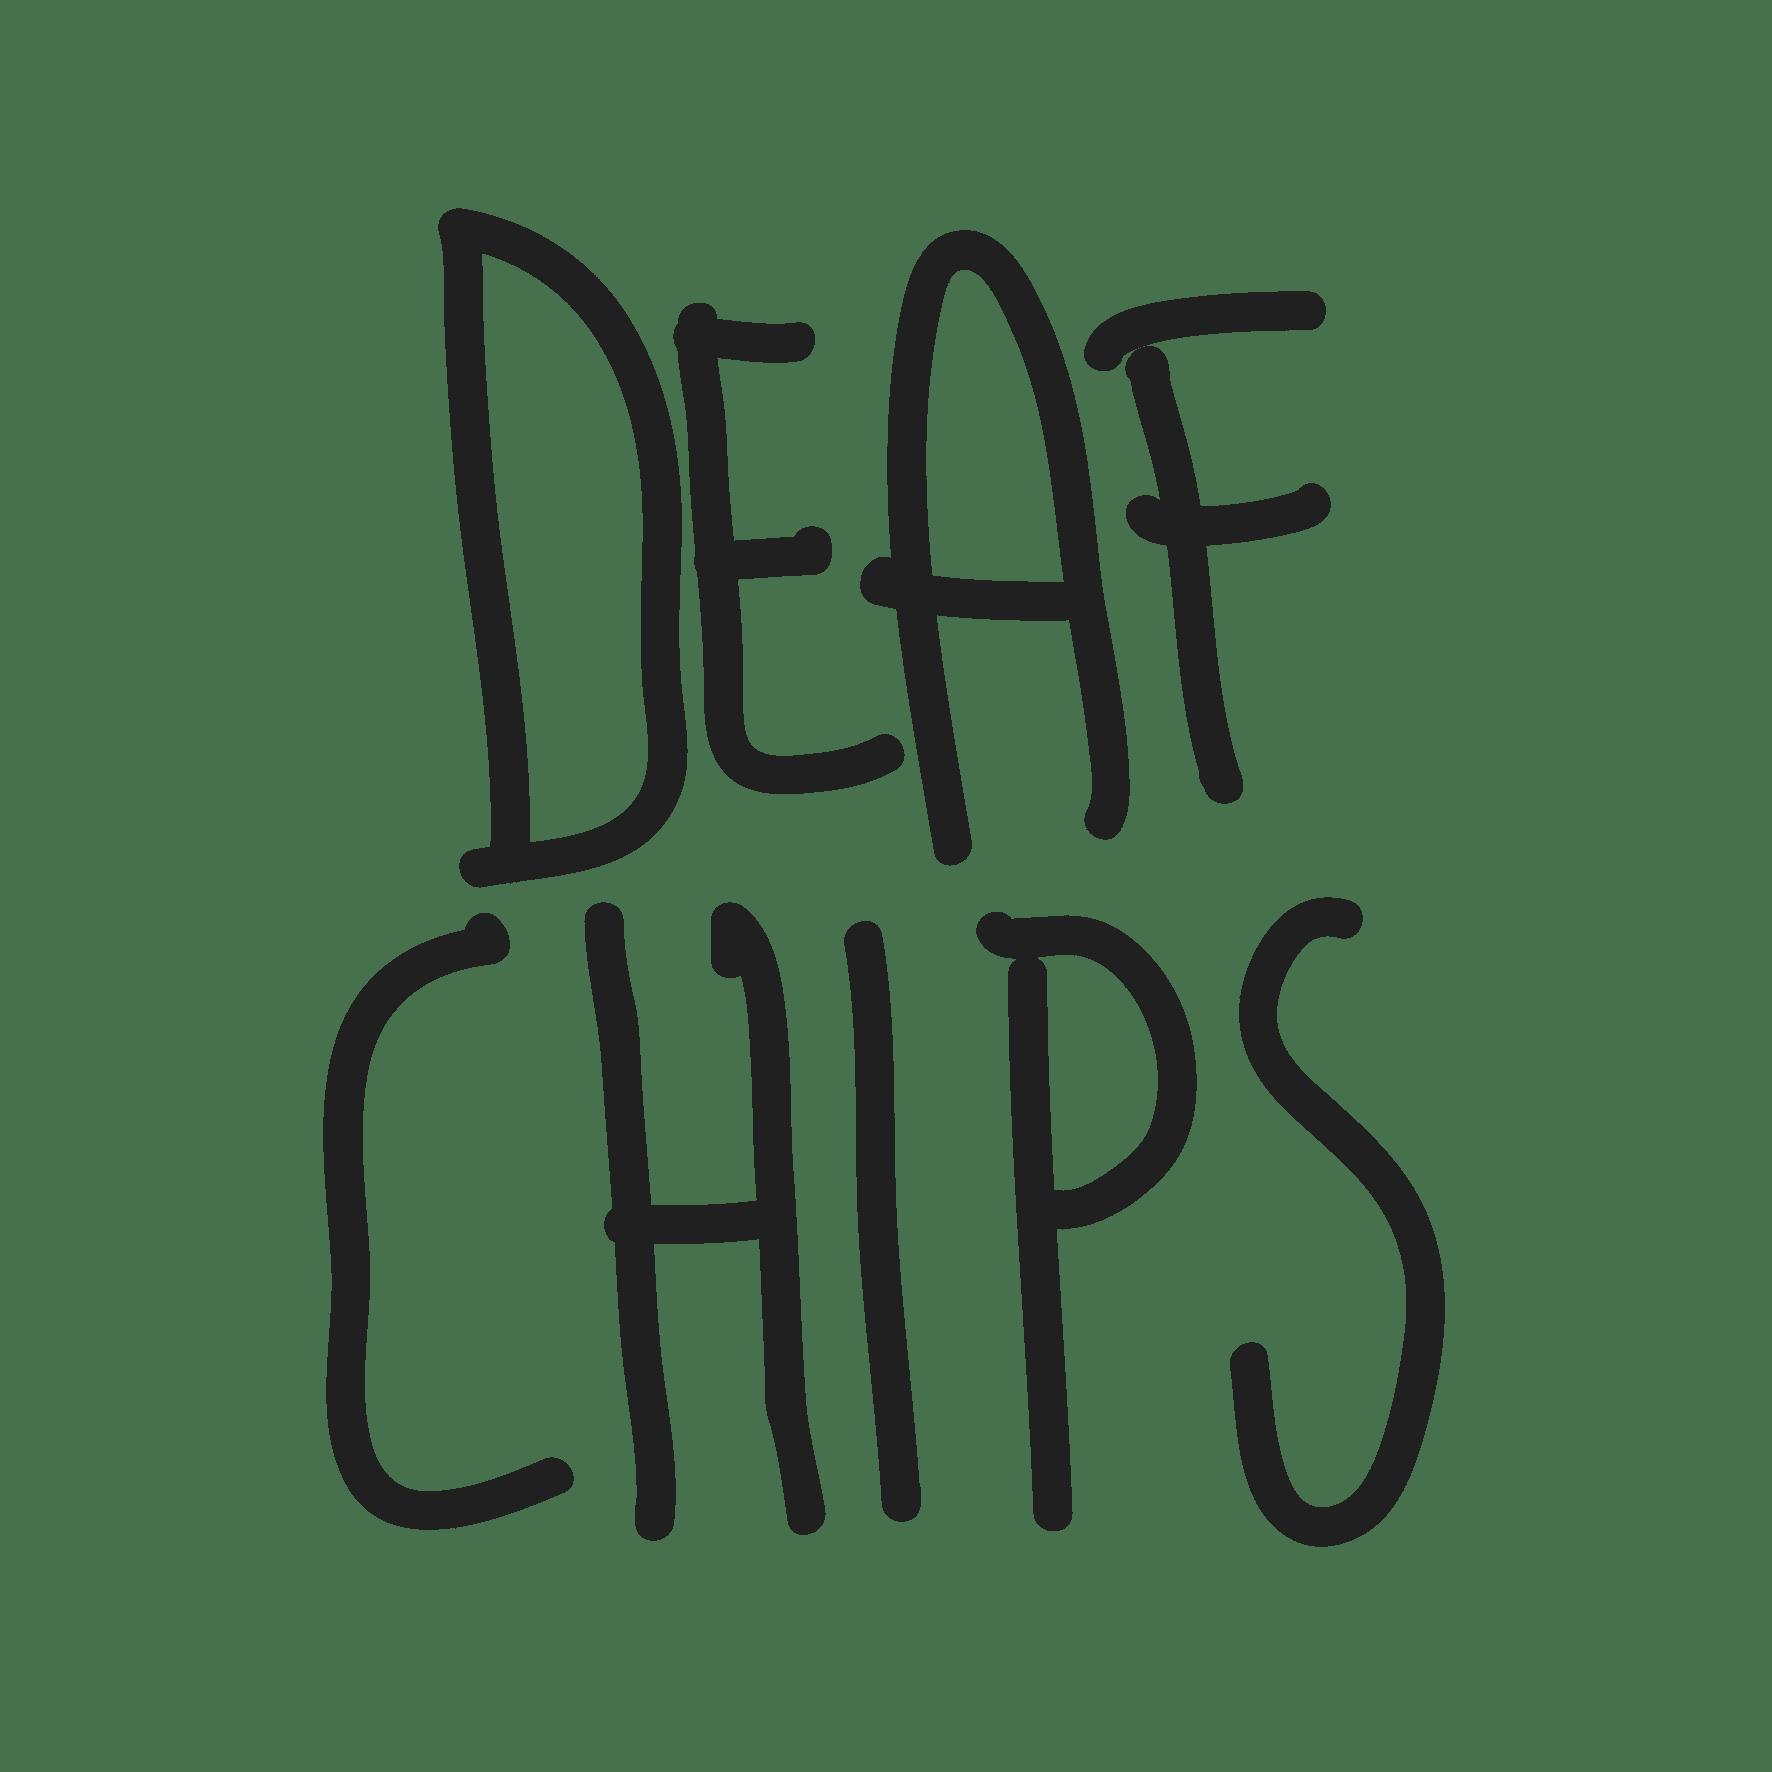 Deafchips